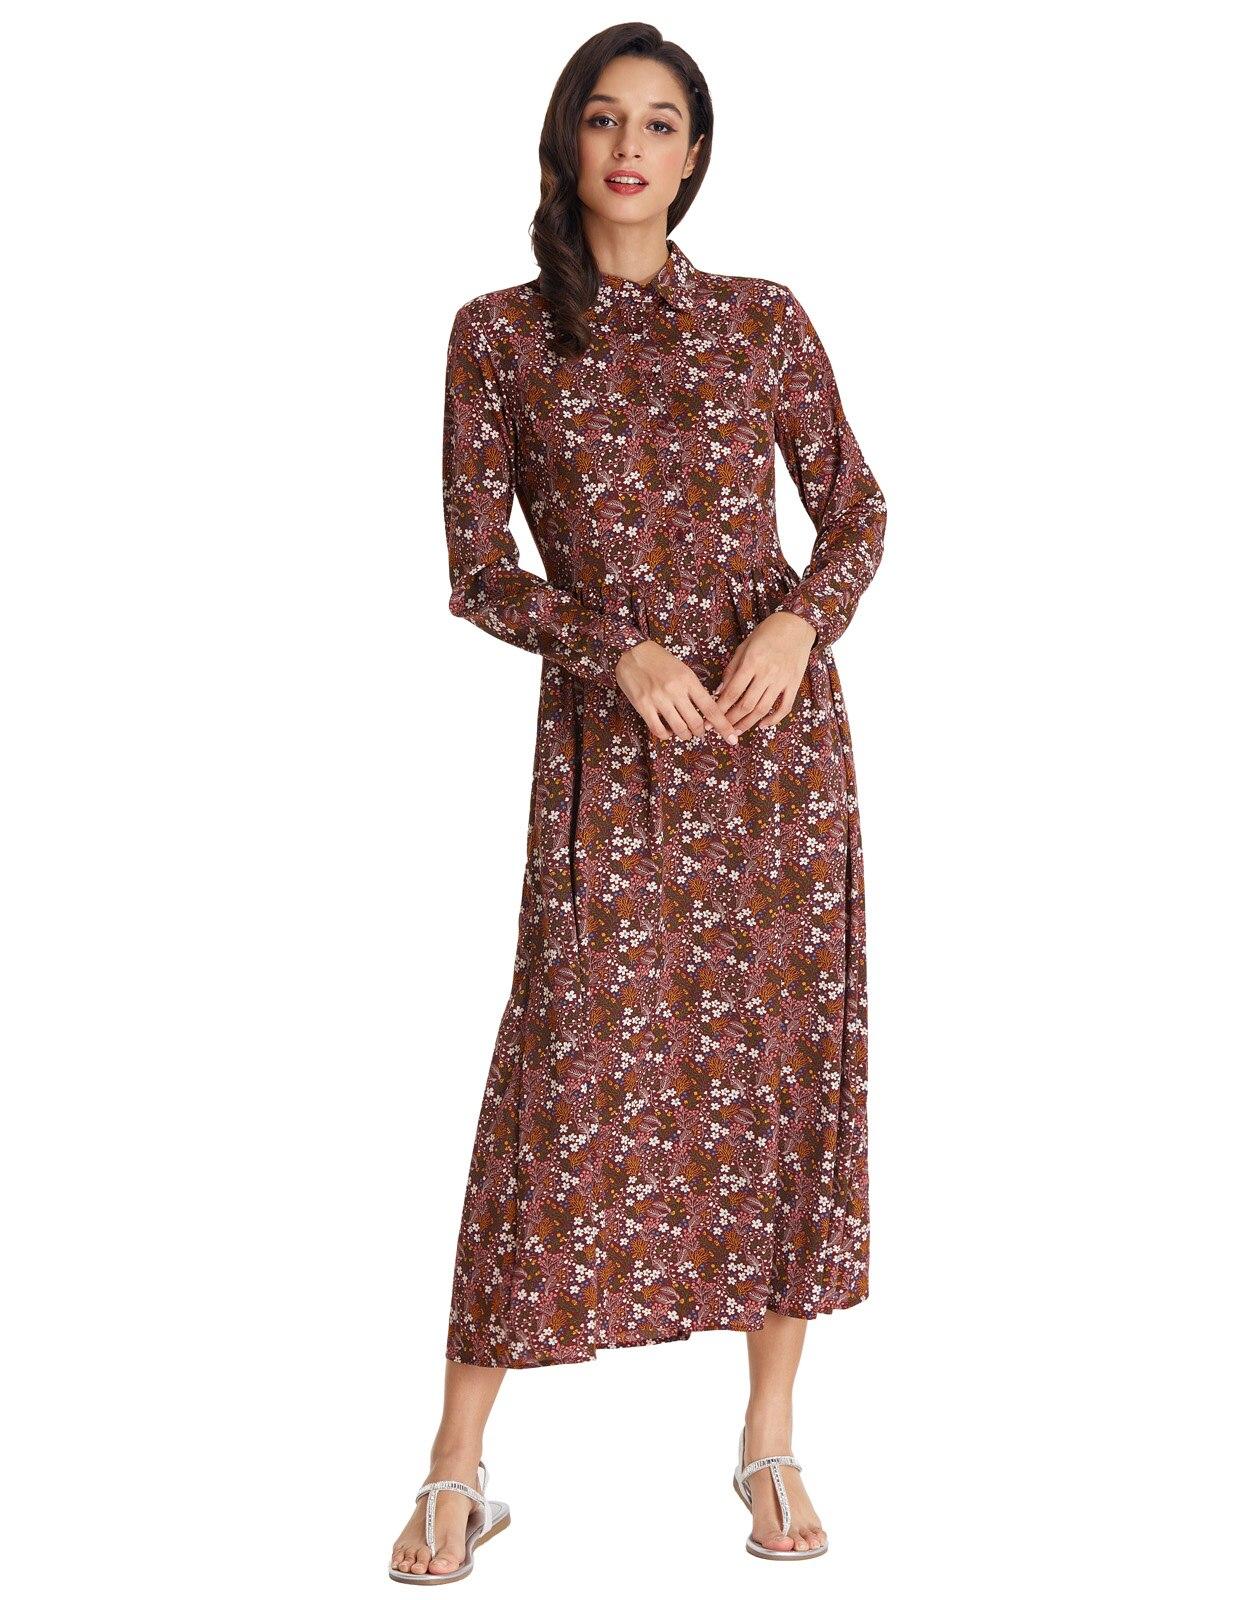 stock vestido Women Vintage floral dress elegant casual Long Sleeve Lapel Collar Bohemian long Maxi Dress Vacation Spring Autumn